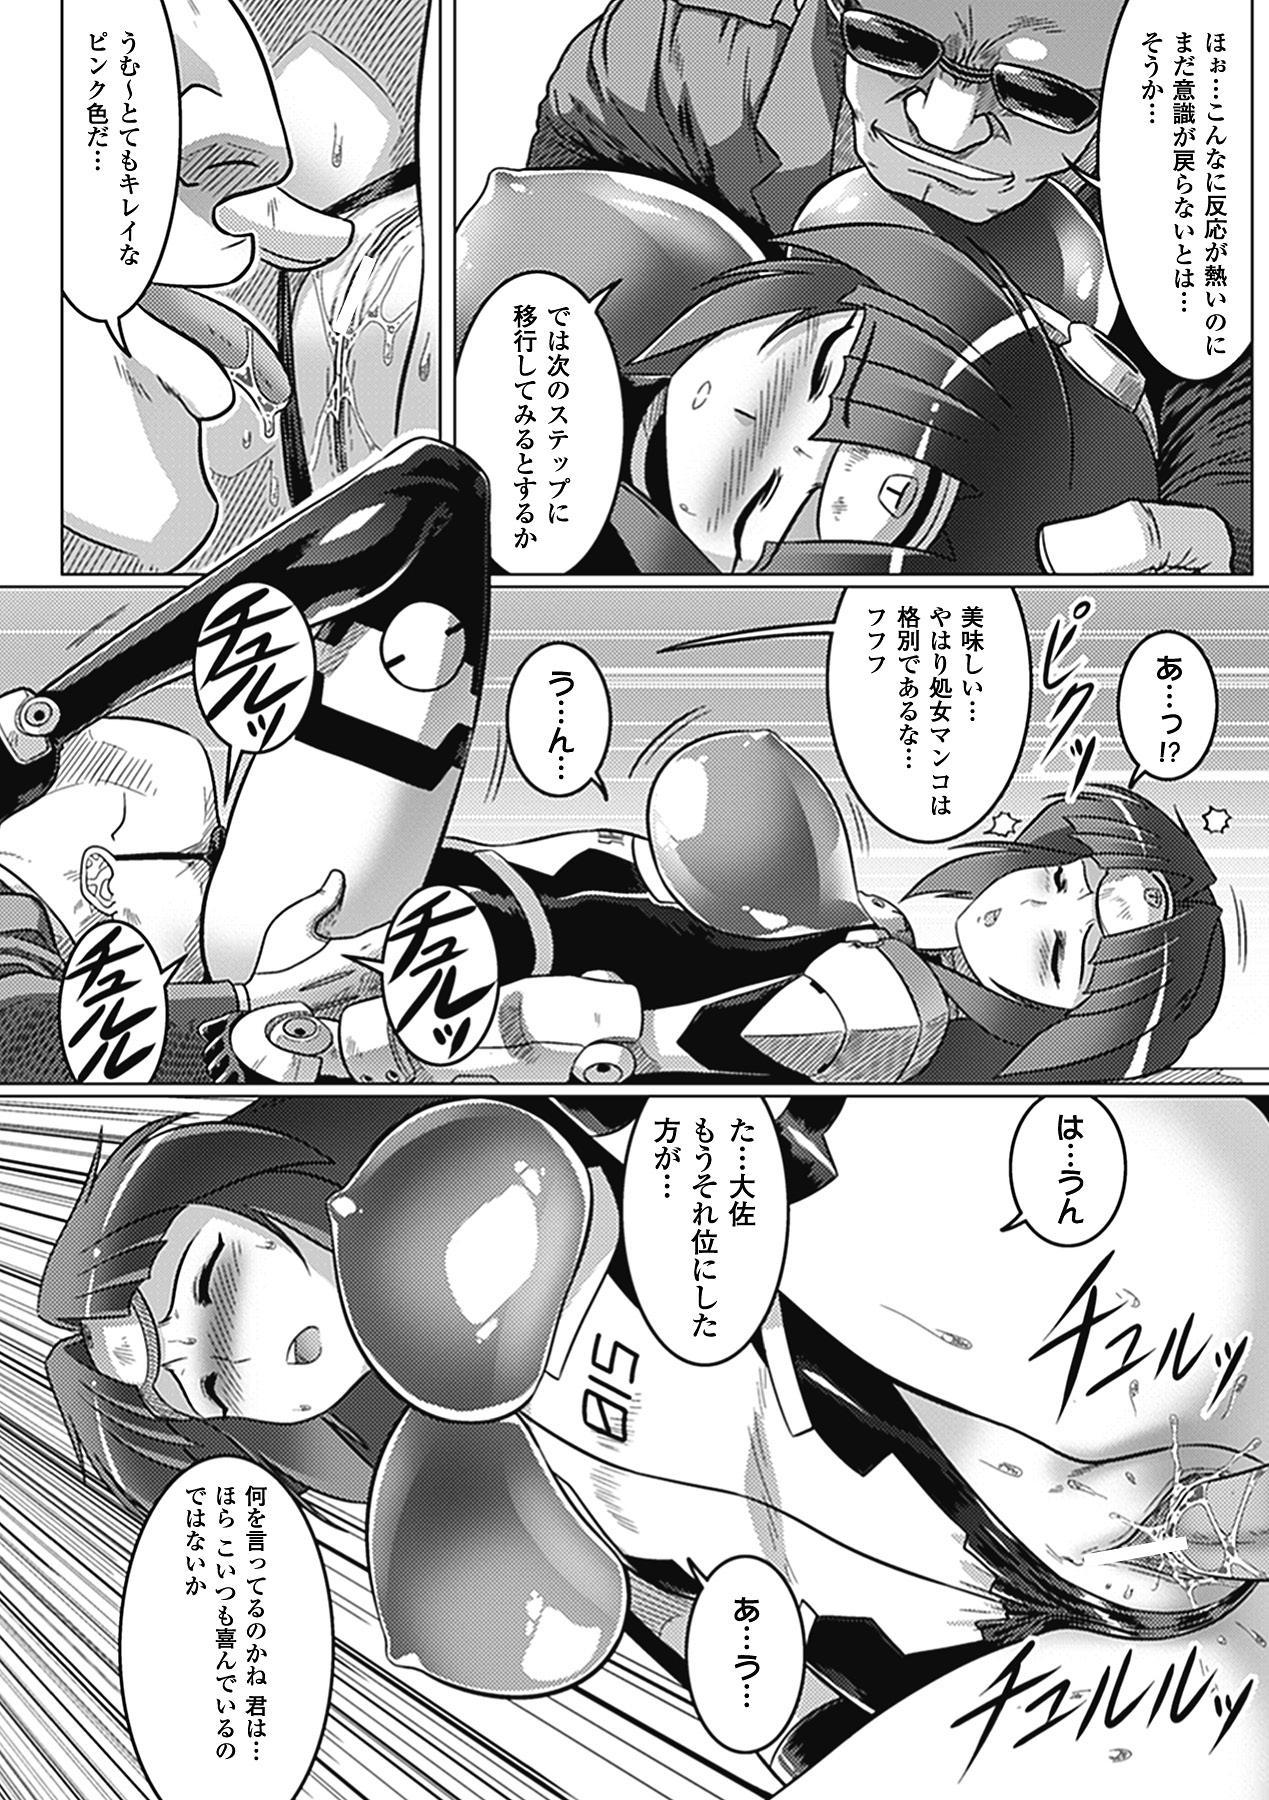 Megami Crisis 5 109